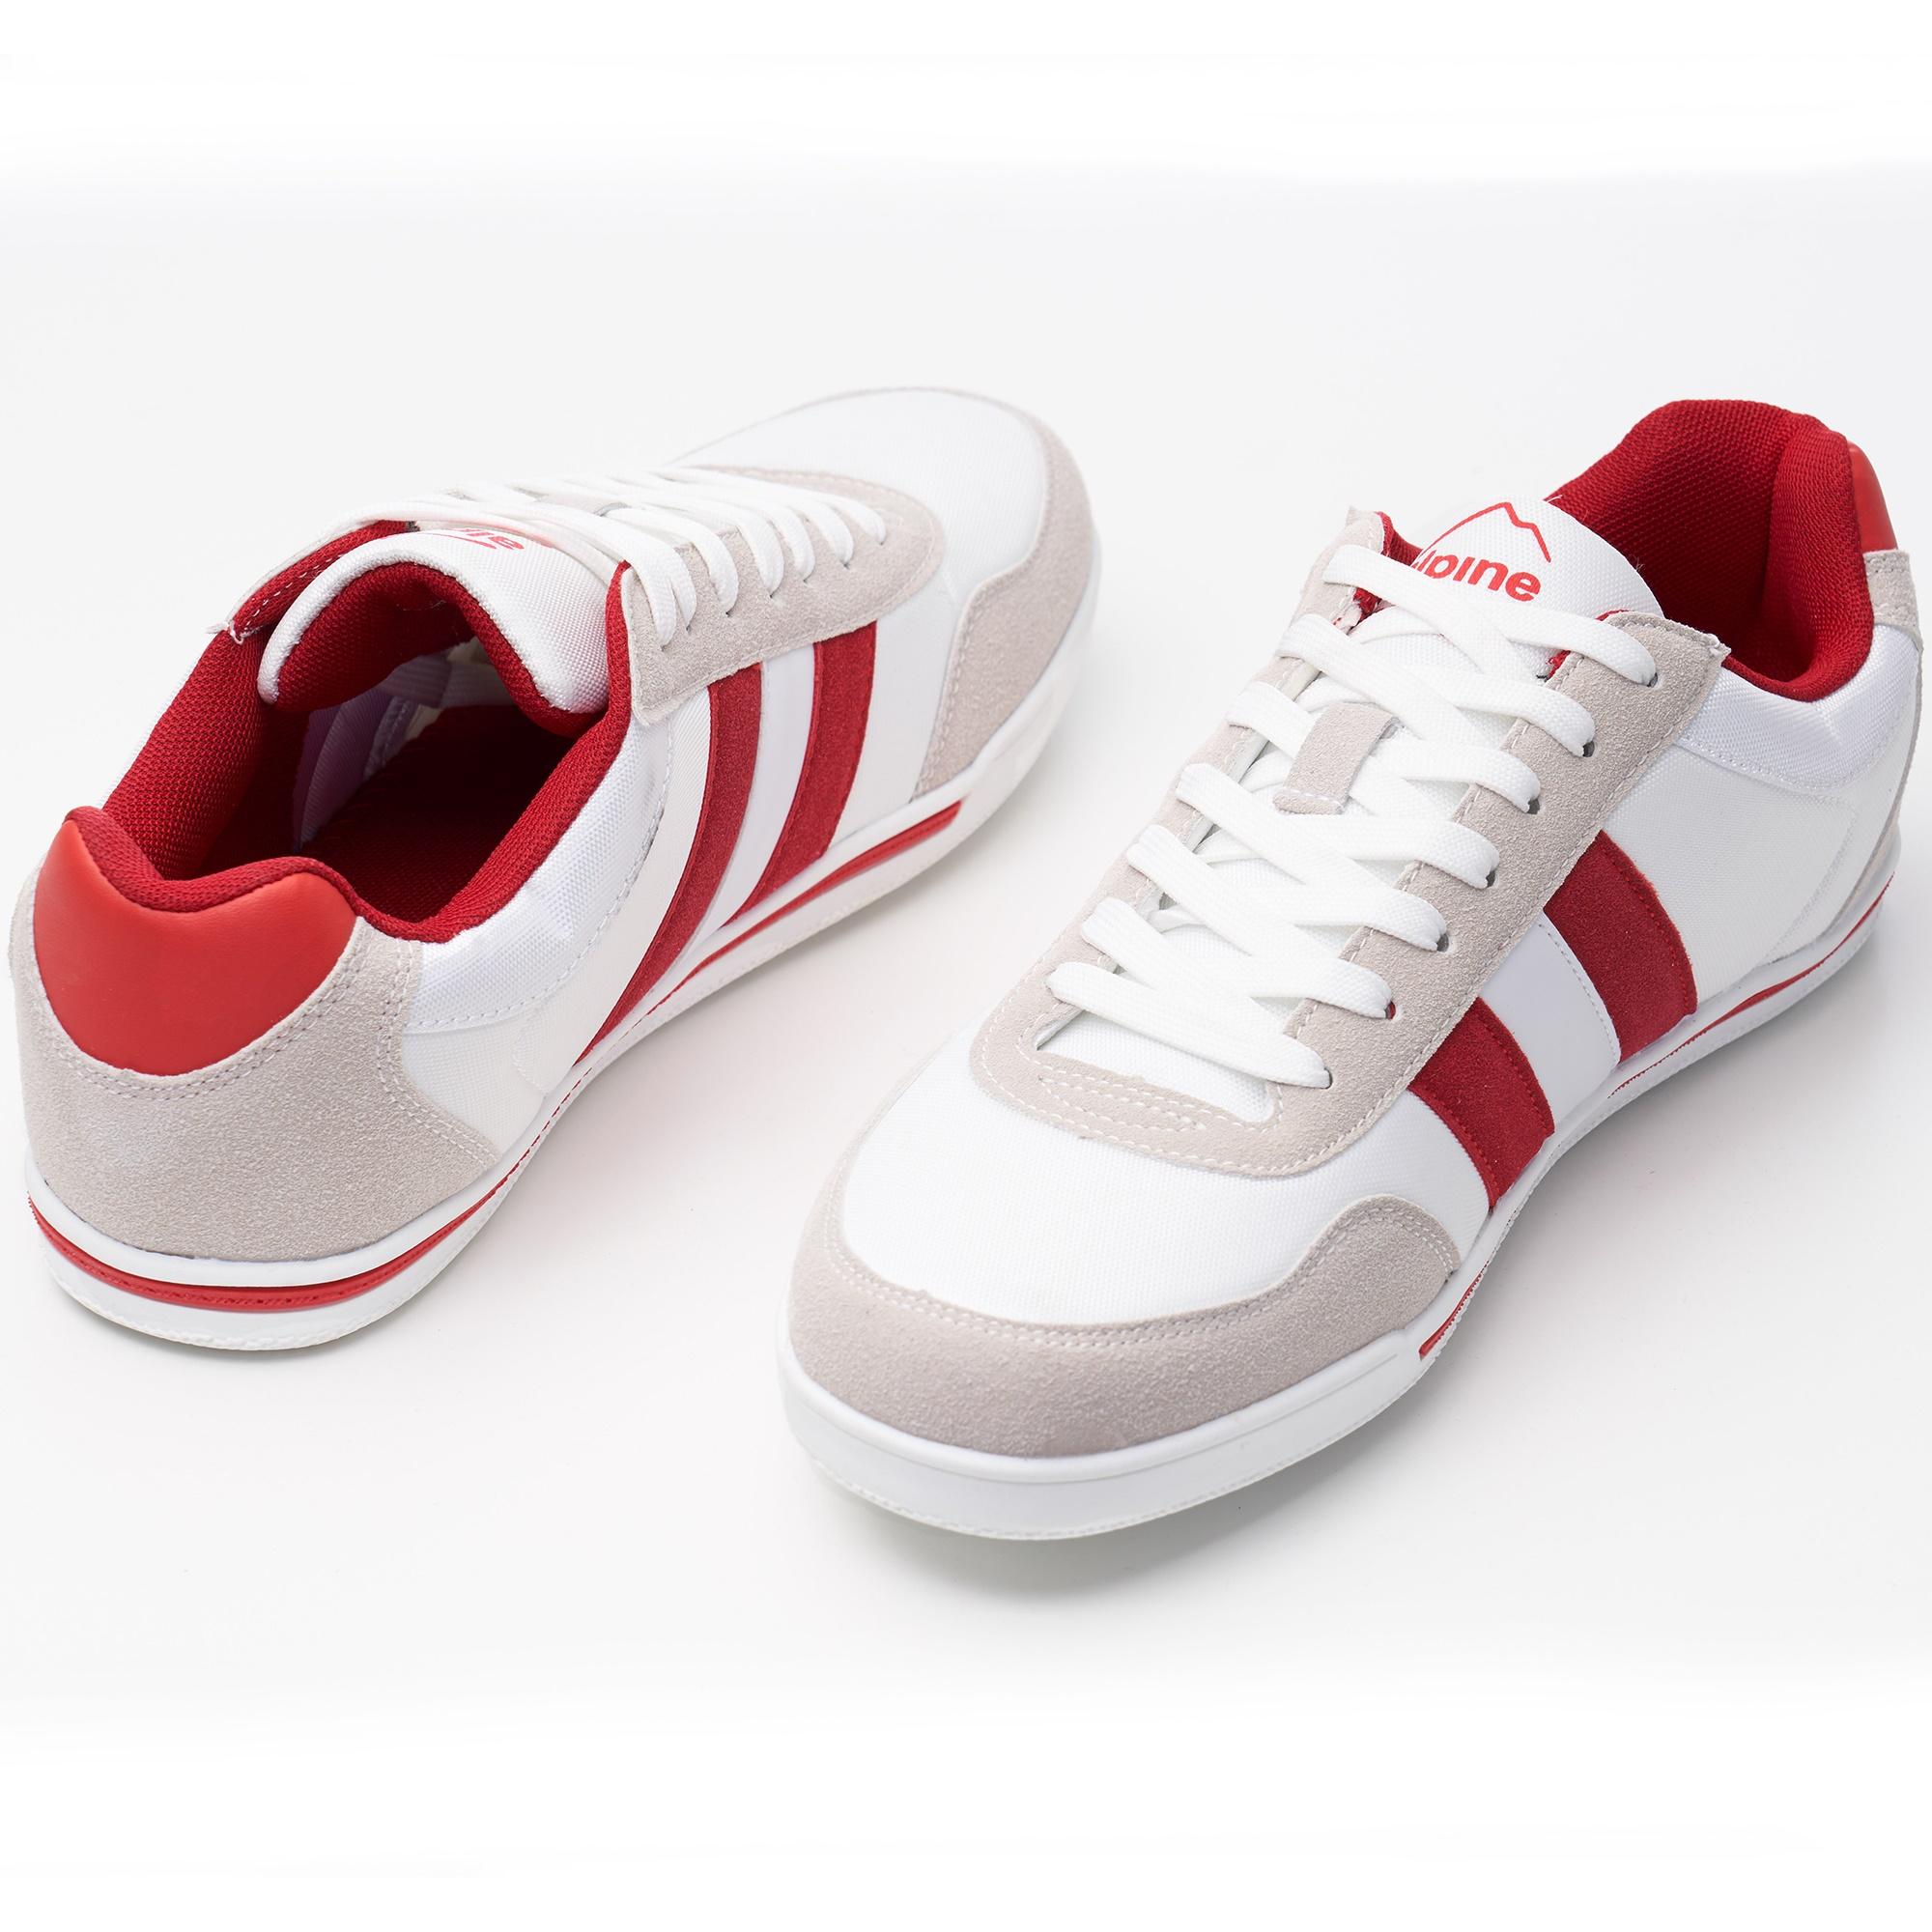 Alpine-Swiss-Haris-Mens-Retro-Striped-Athletic-Shoes-Fashion-Sneaker-Tennis-Shoe thumbnail 17